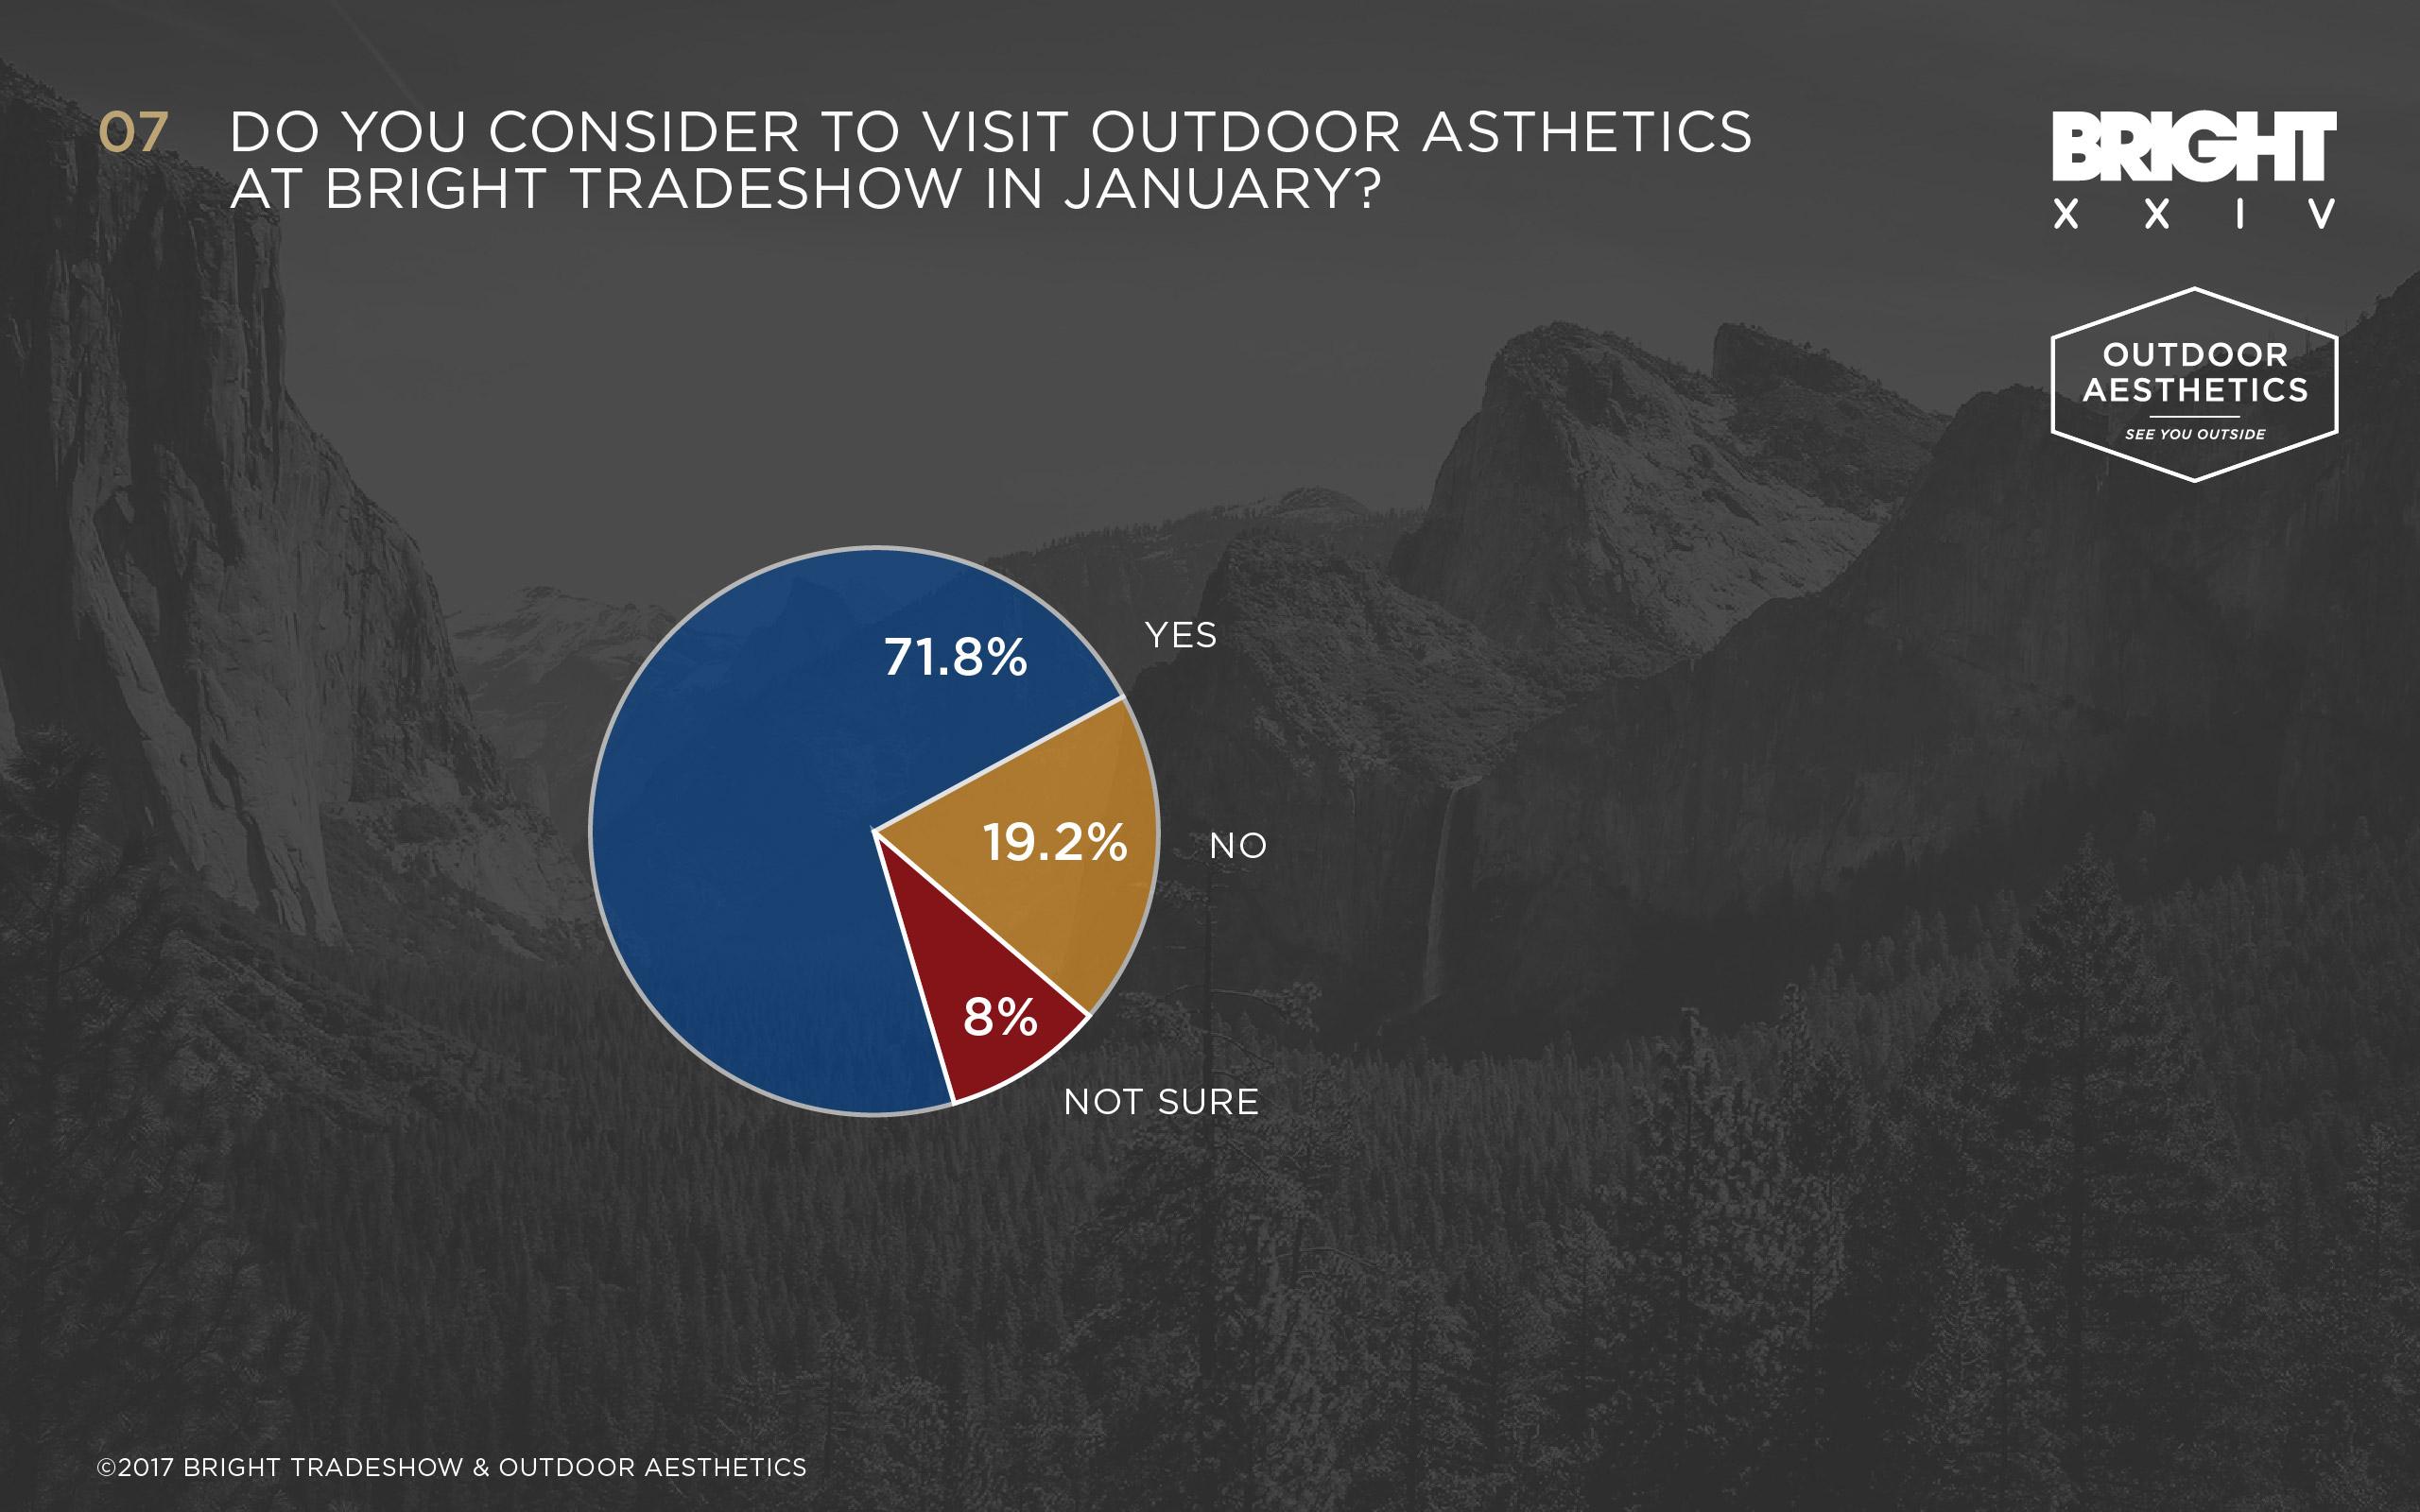 outdoor-aesthetics-trend-survey-2017-09